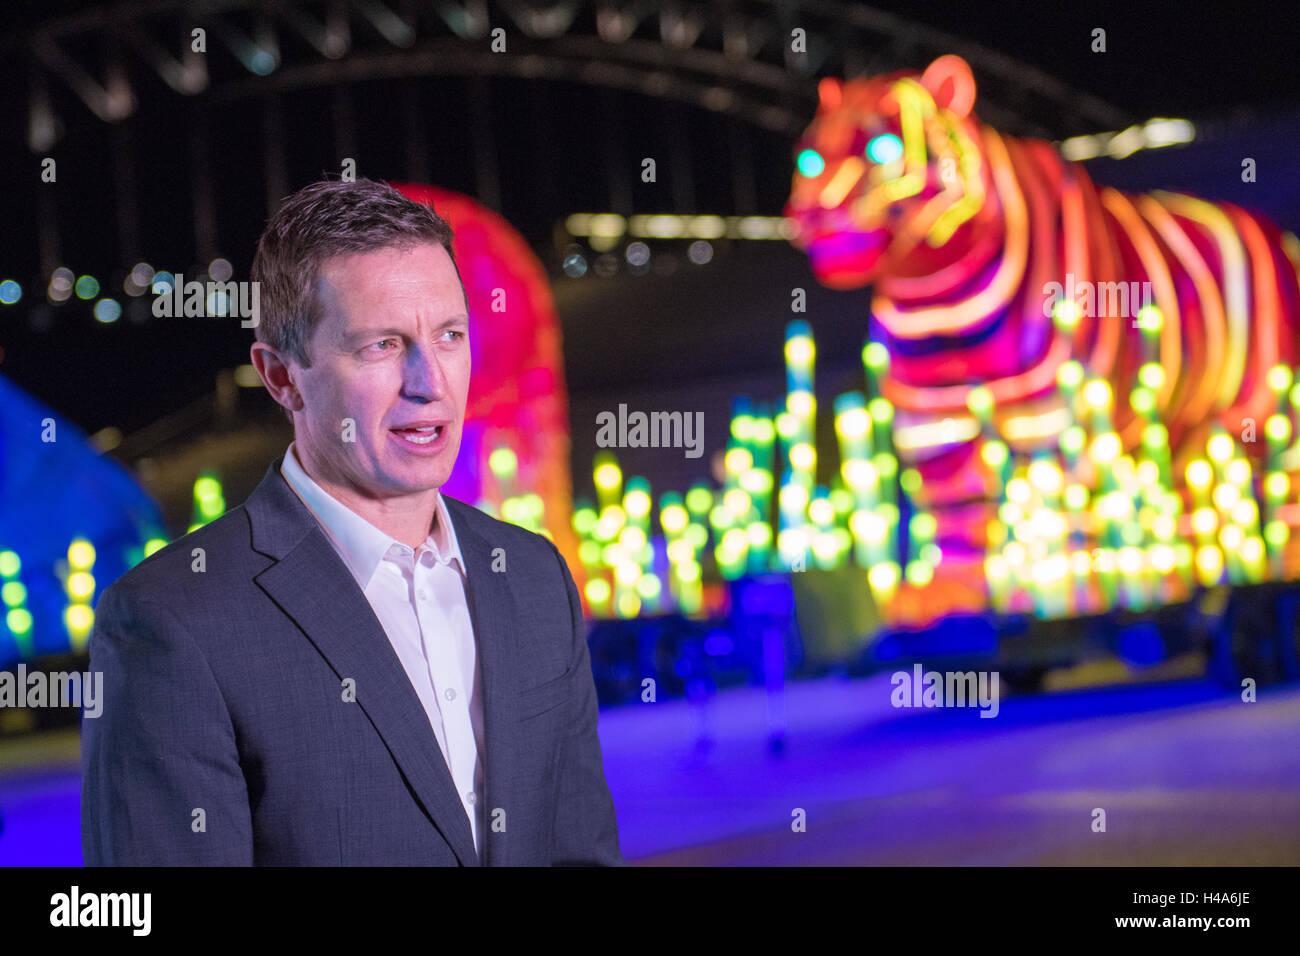 Sydney, Australia - 15th October 2016: Animal Light scupltures lighted the streets of Sydney to celebrate Taronga - Stock Image